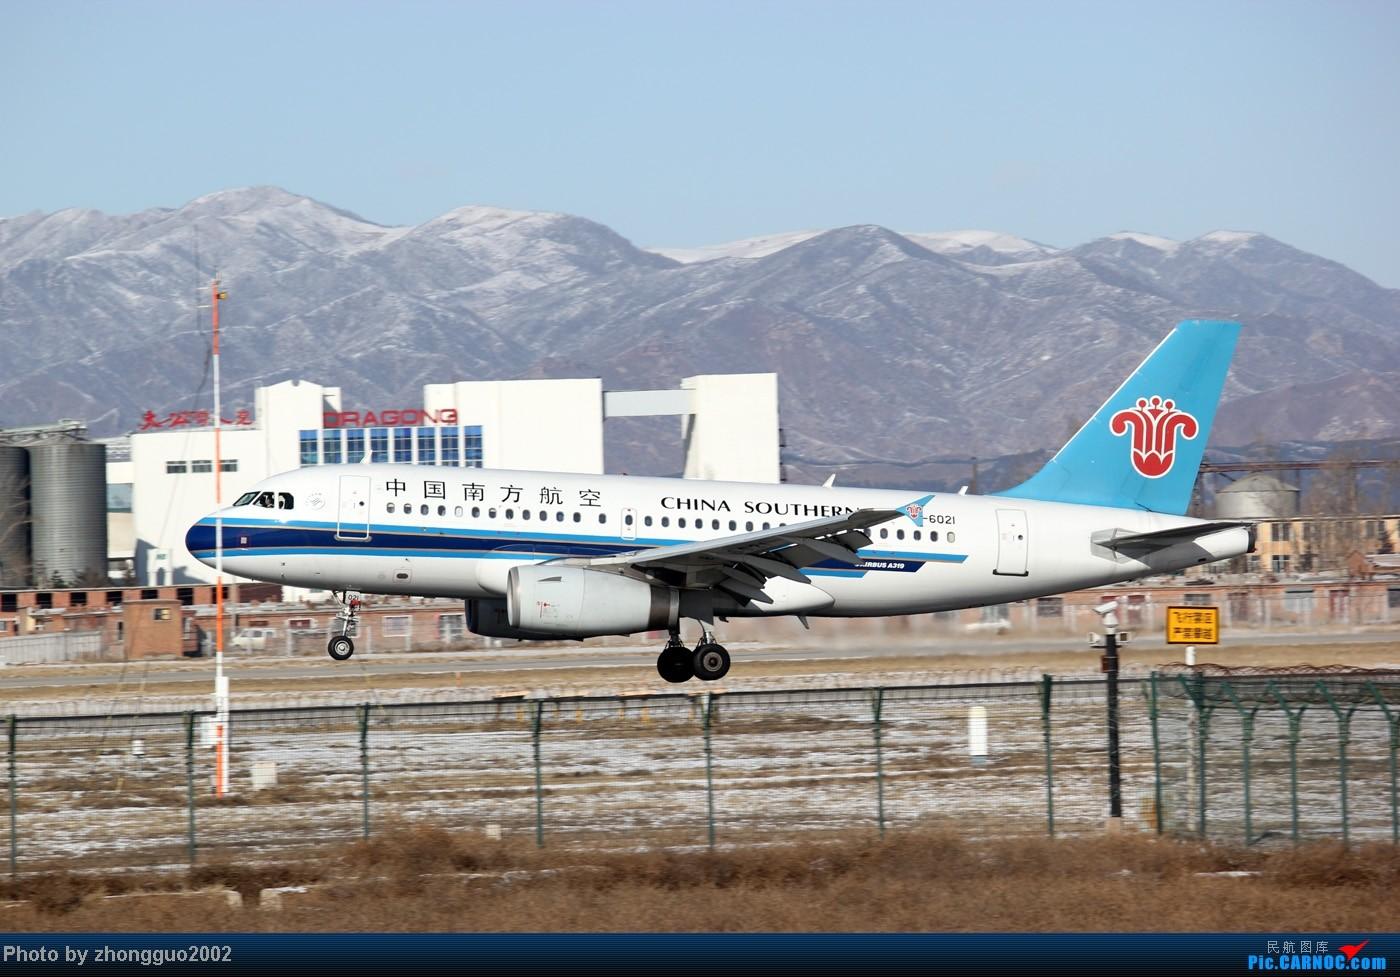 Re:[原创]随着2012年的最后一场雪的到了,我的2012年拍机工作也圆满的结束了,把这段时间里灰机整理一下,把没发的,我个人认为好的发上来! AIRBUS A319-100 B-6021 中国呼和浩特白塔国际机场